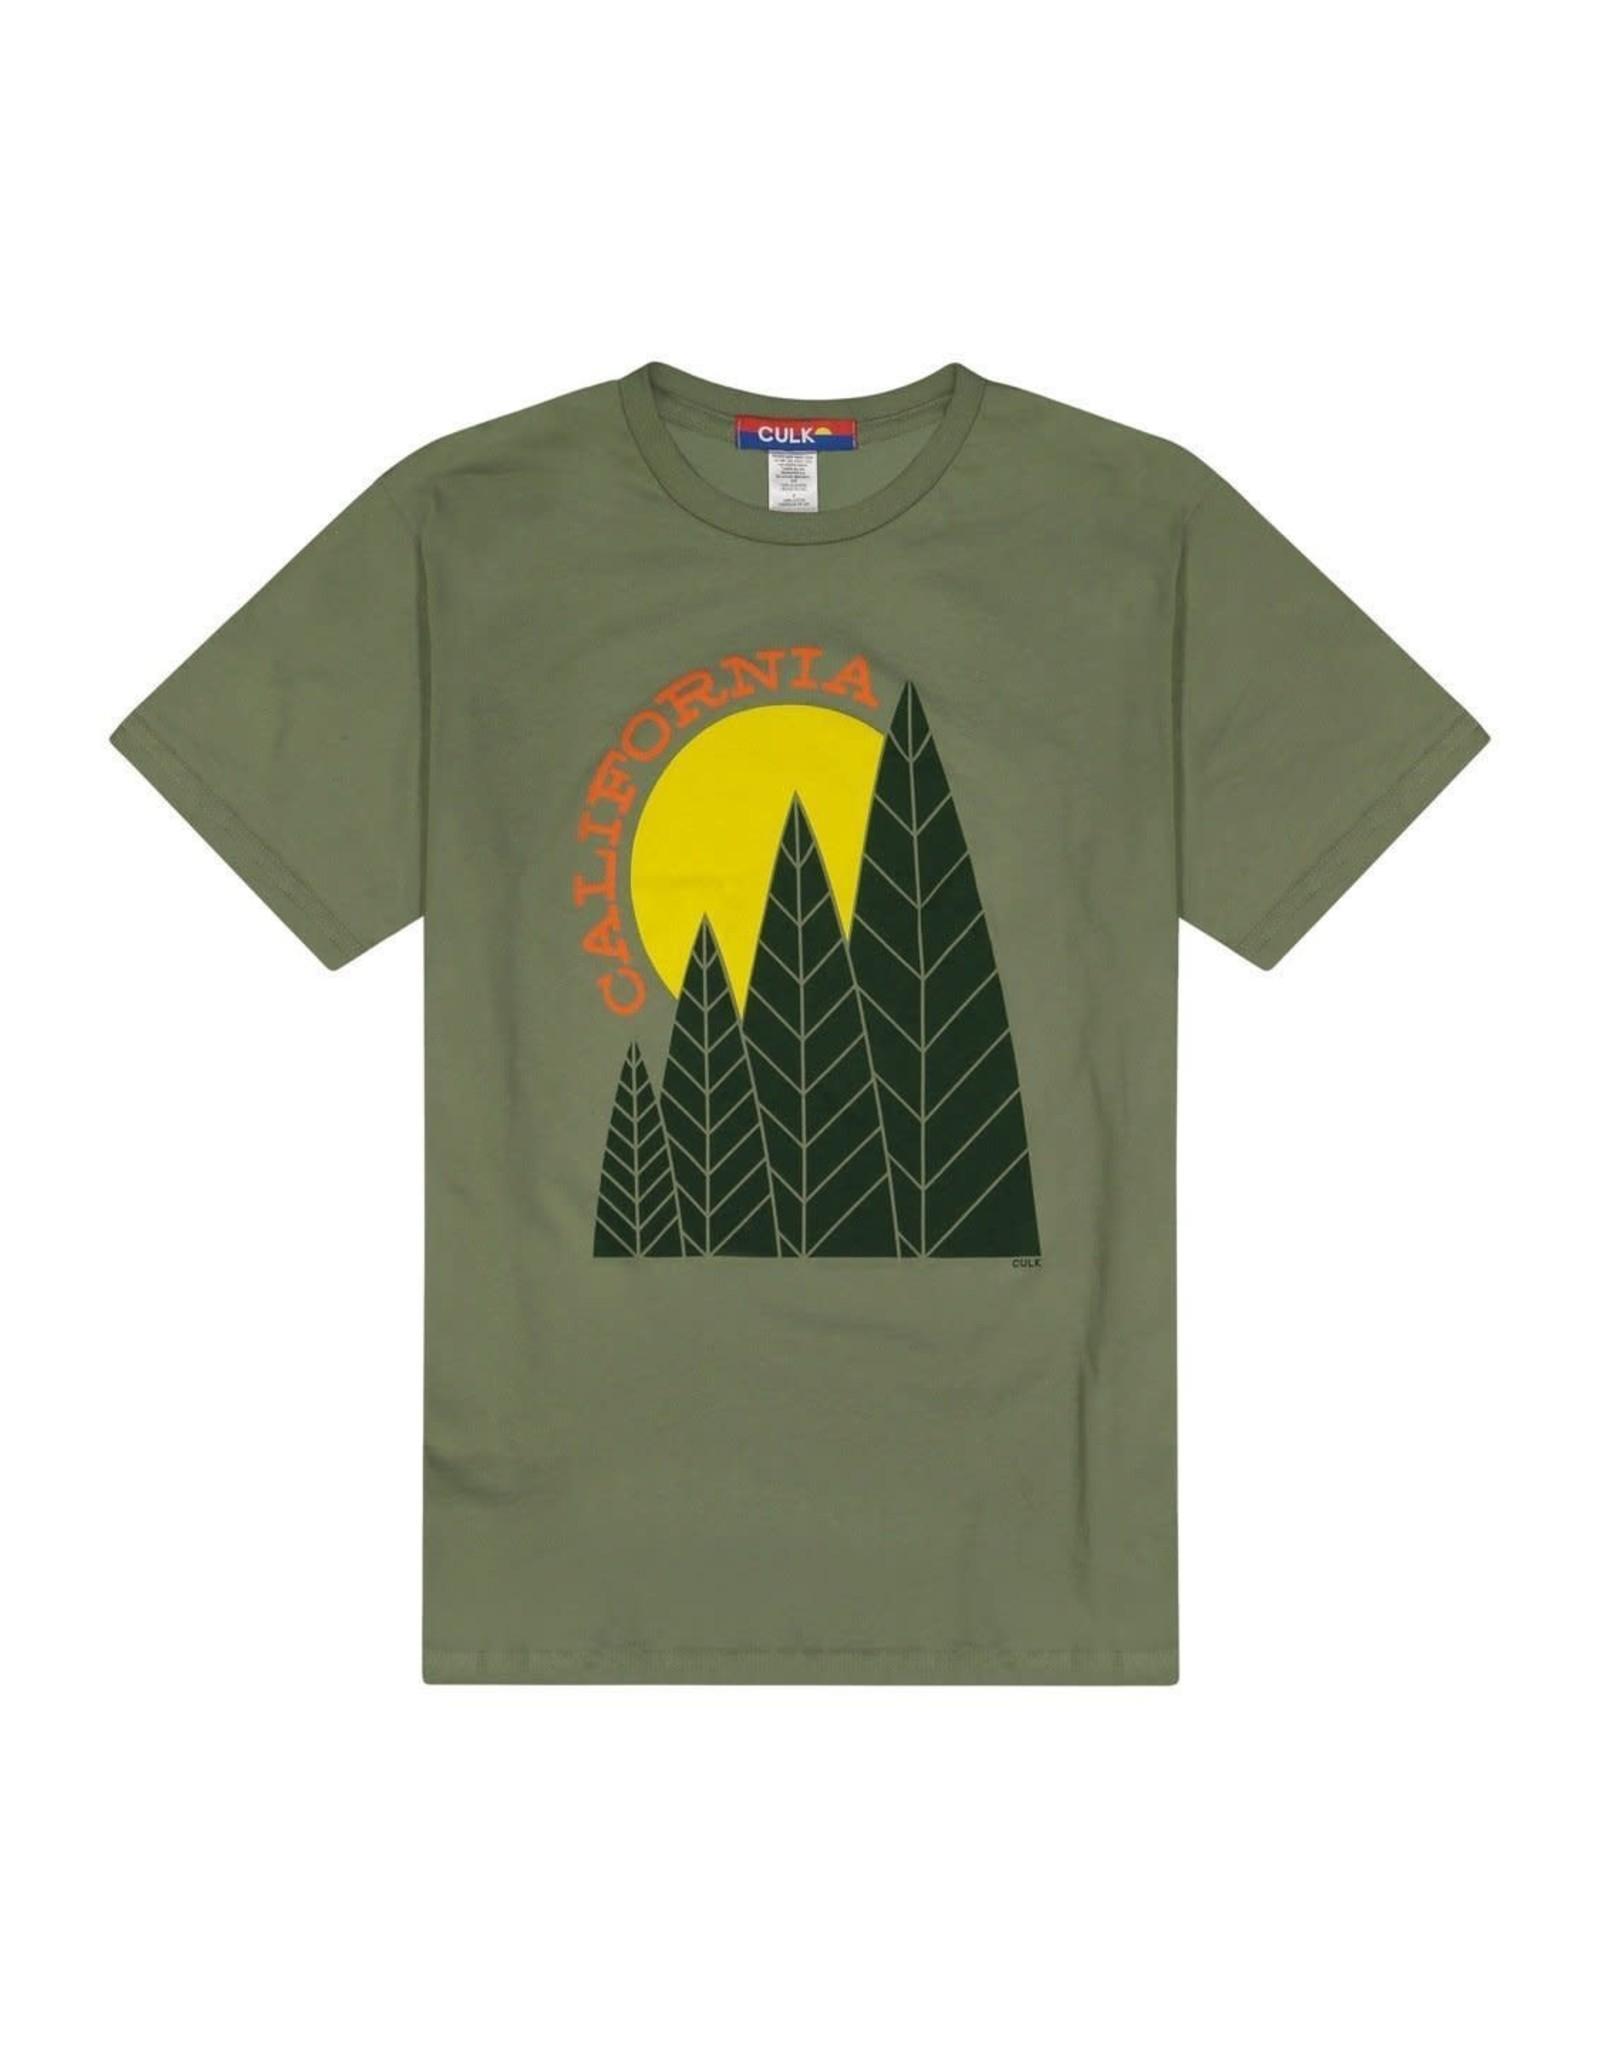 Culk California Tree Sun Tee - Olive